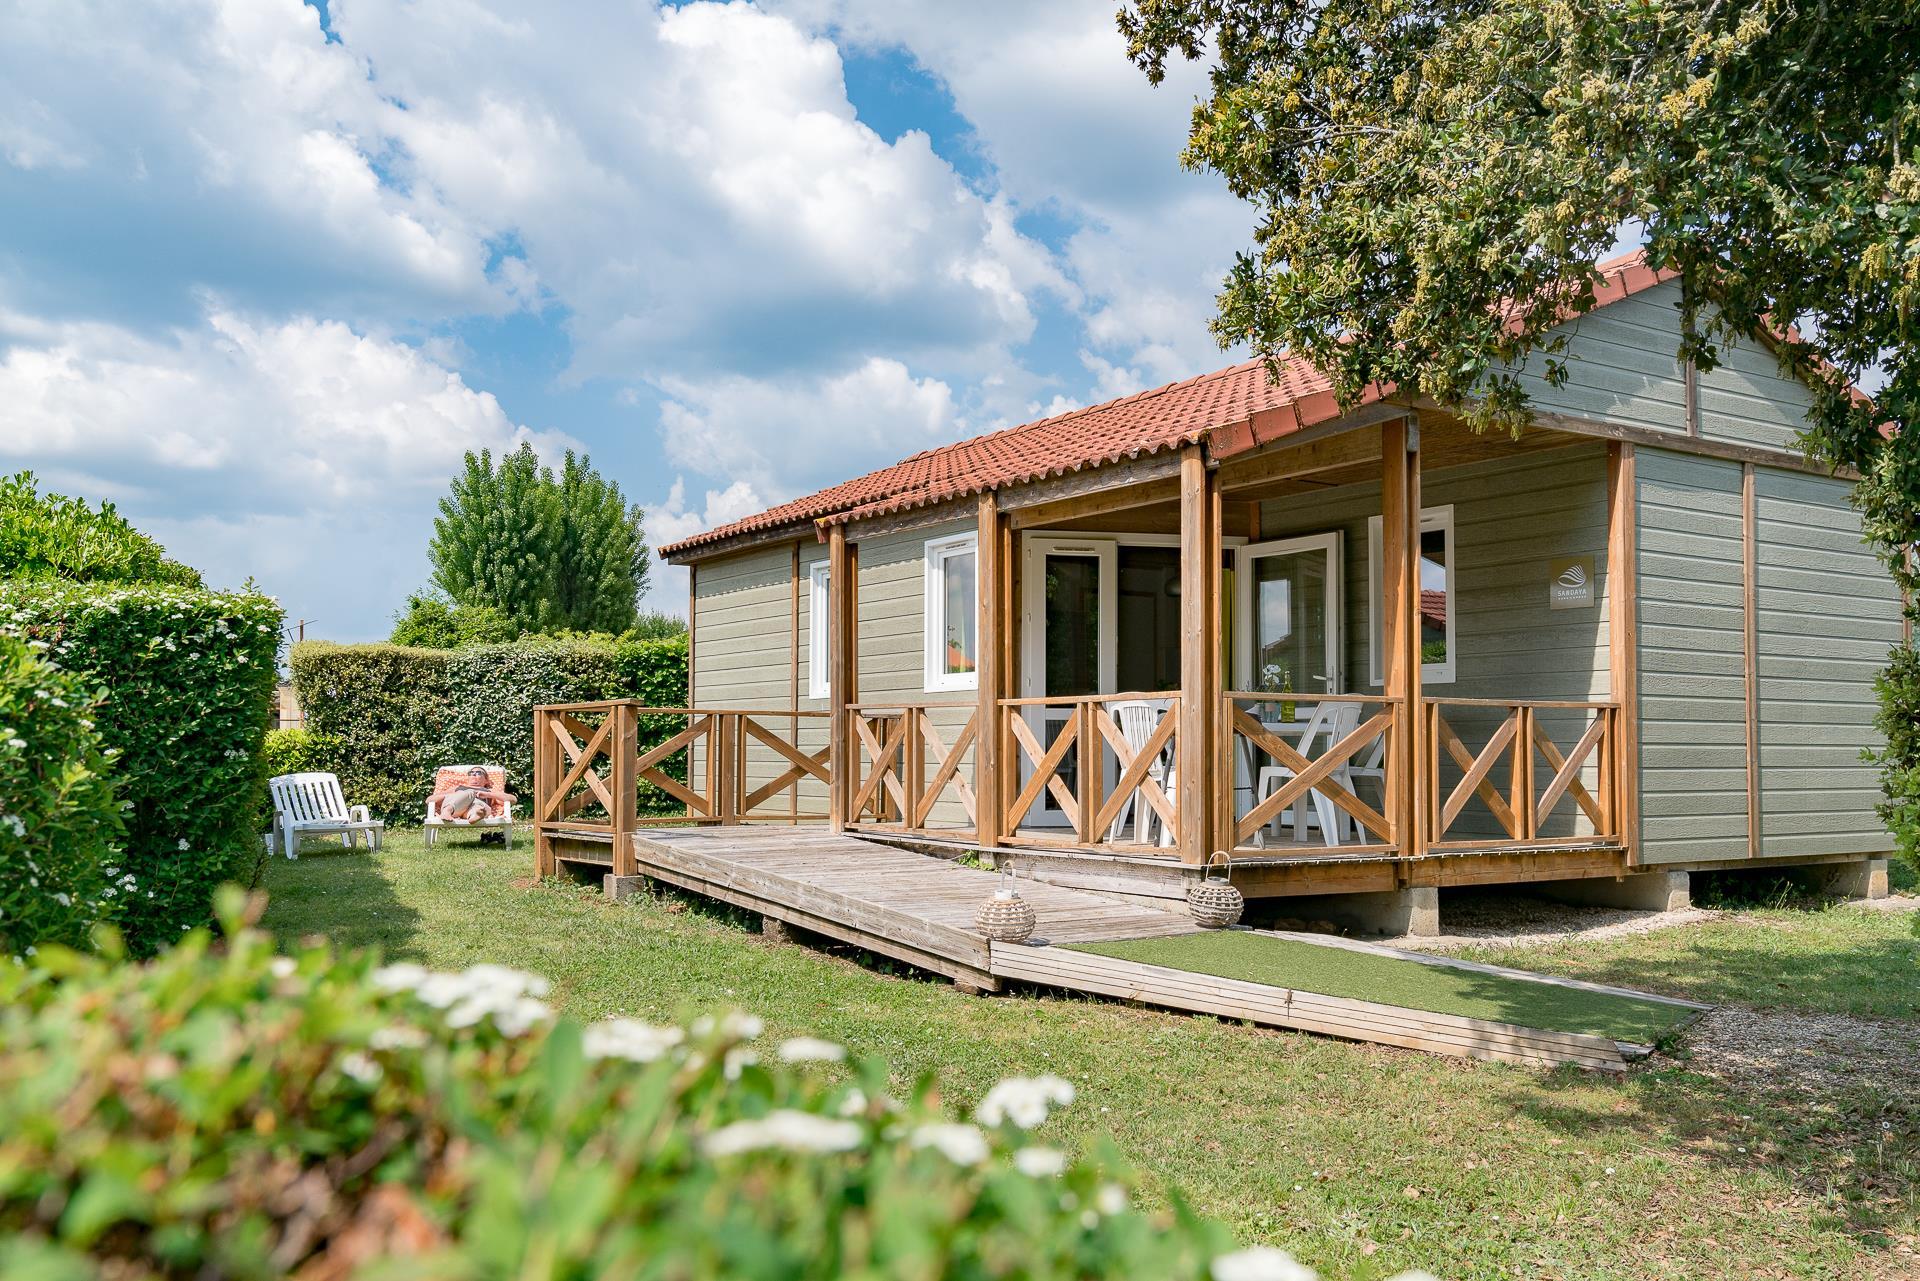 Location - Chalet Topaze Pmr 2 Chambres *** - Camping Sandaya Les Péneyrals